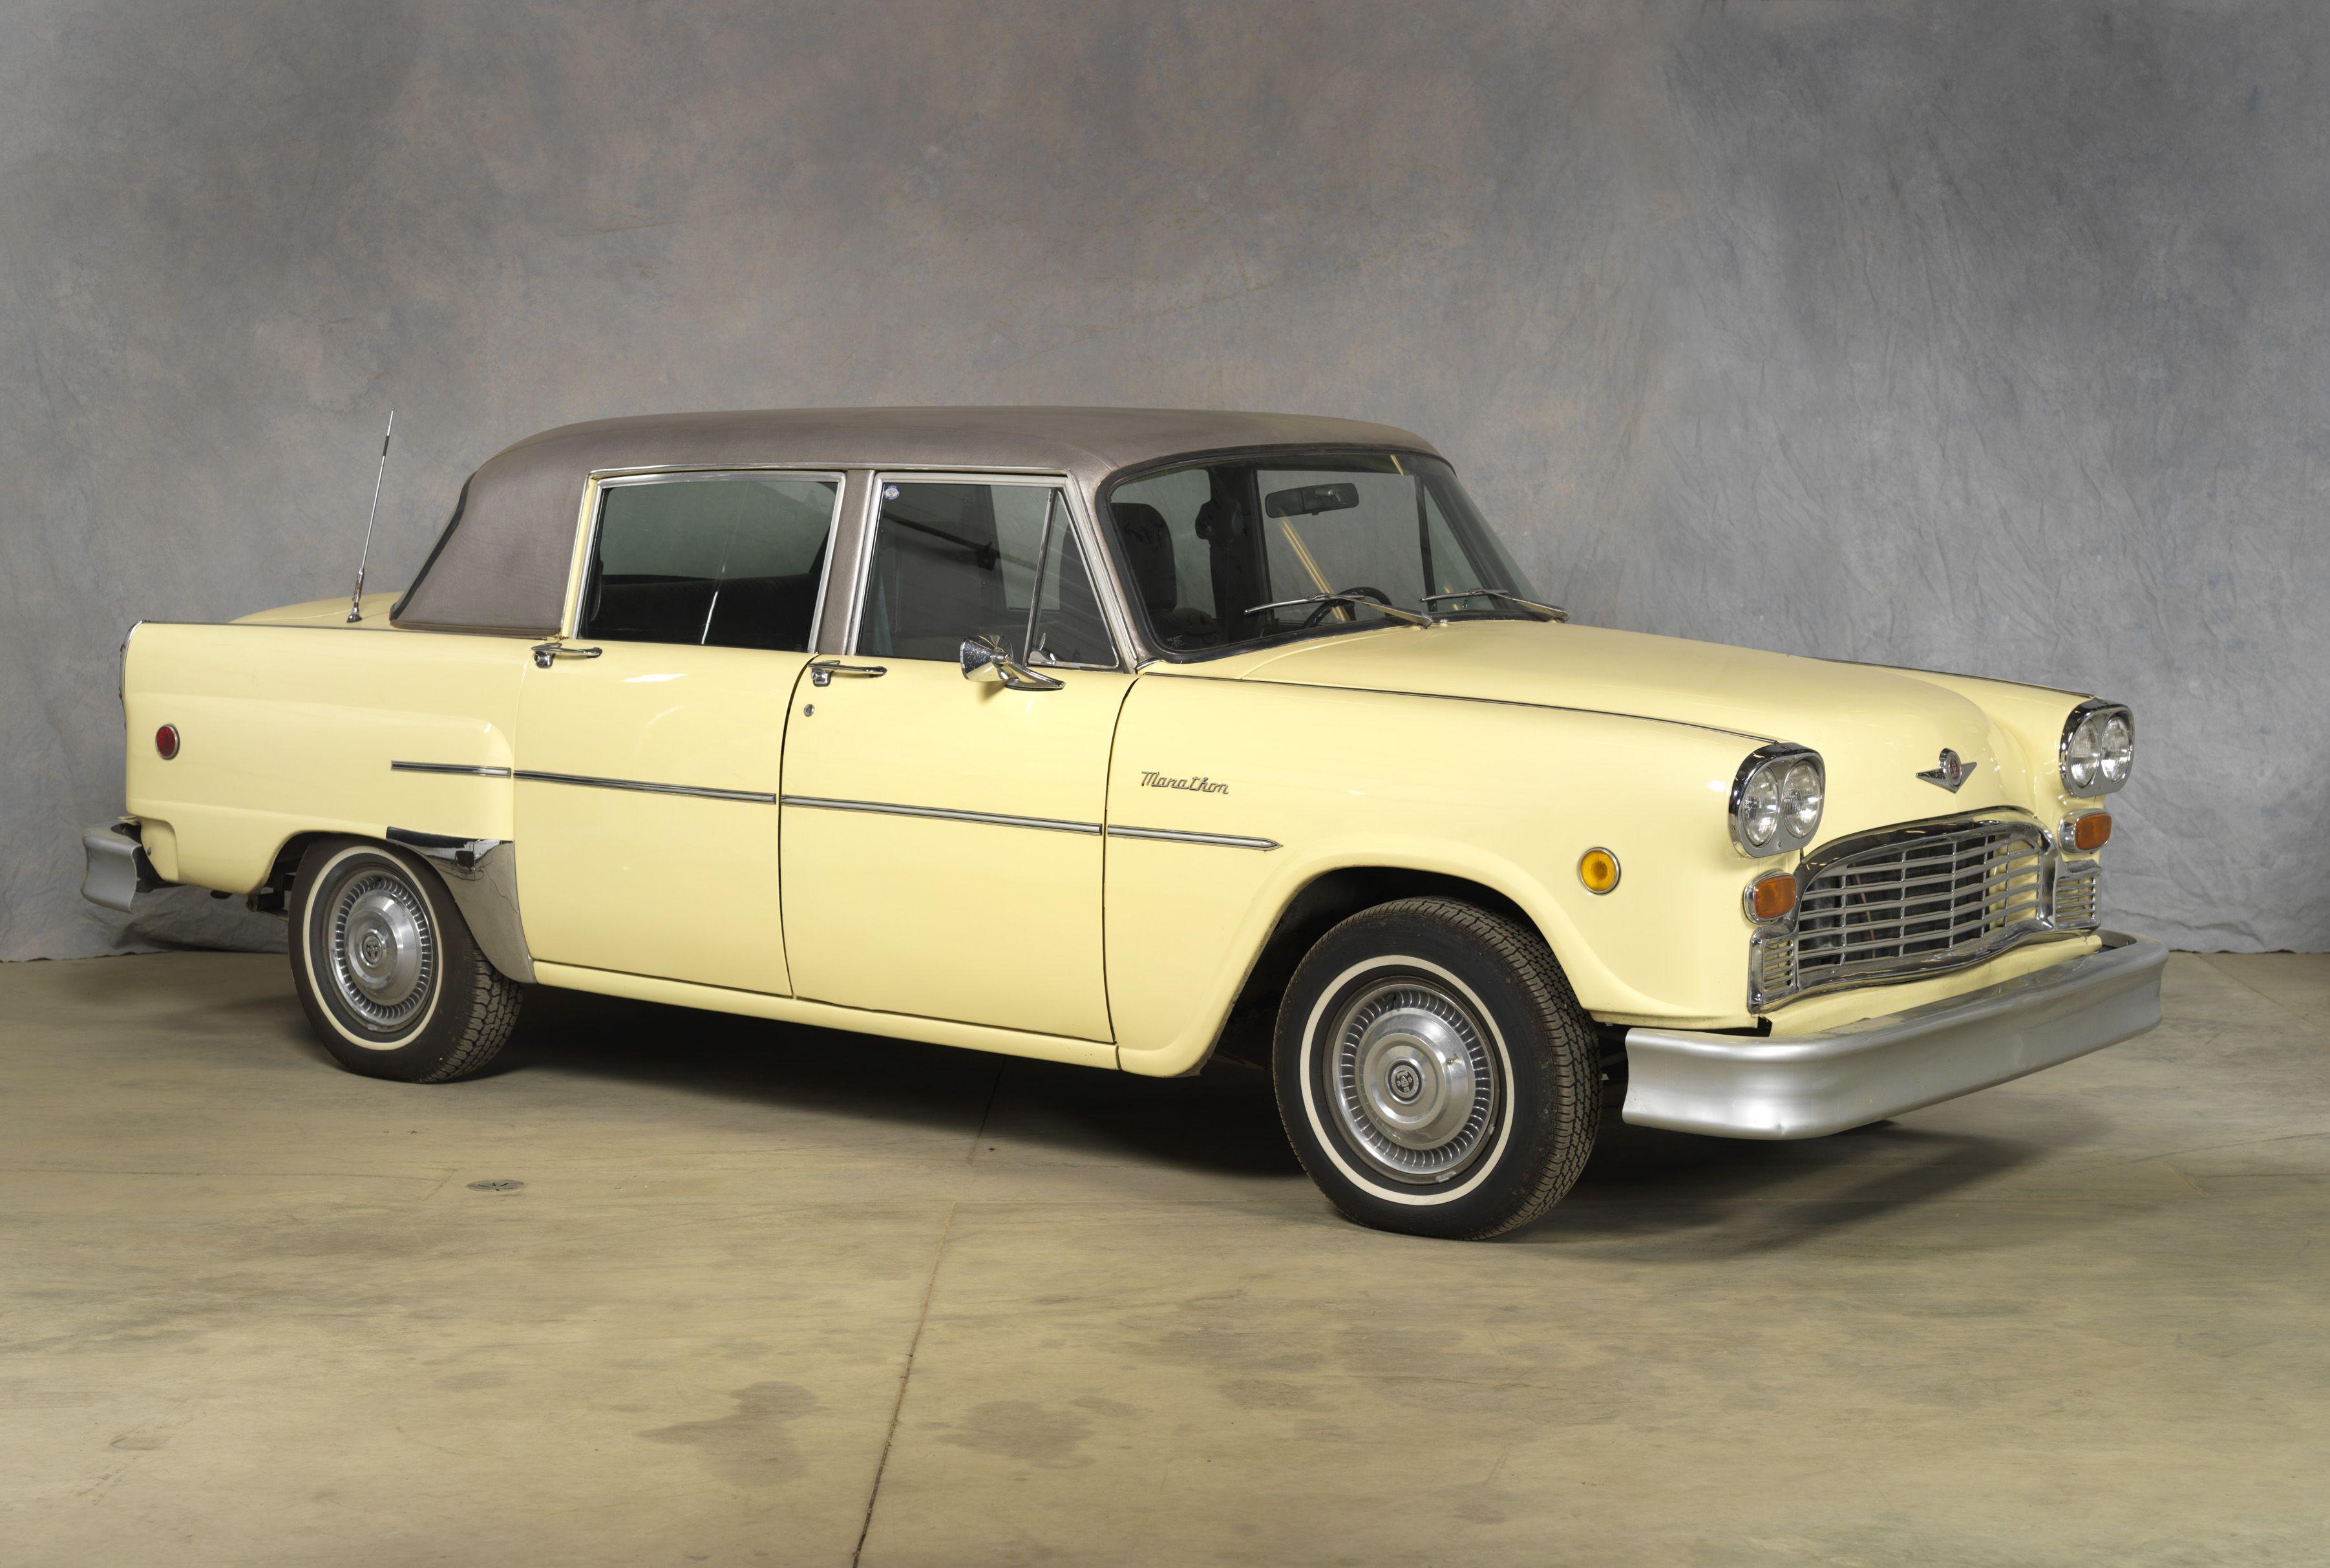 1981 checker marathon sedan in 1922 the checker cab manufacturing company was formed in